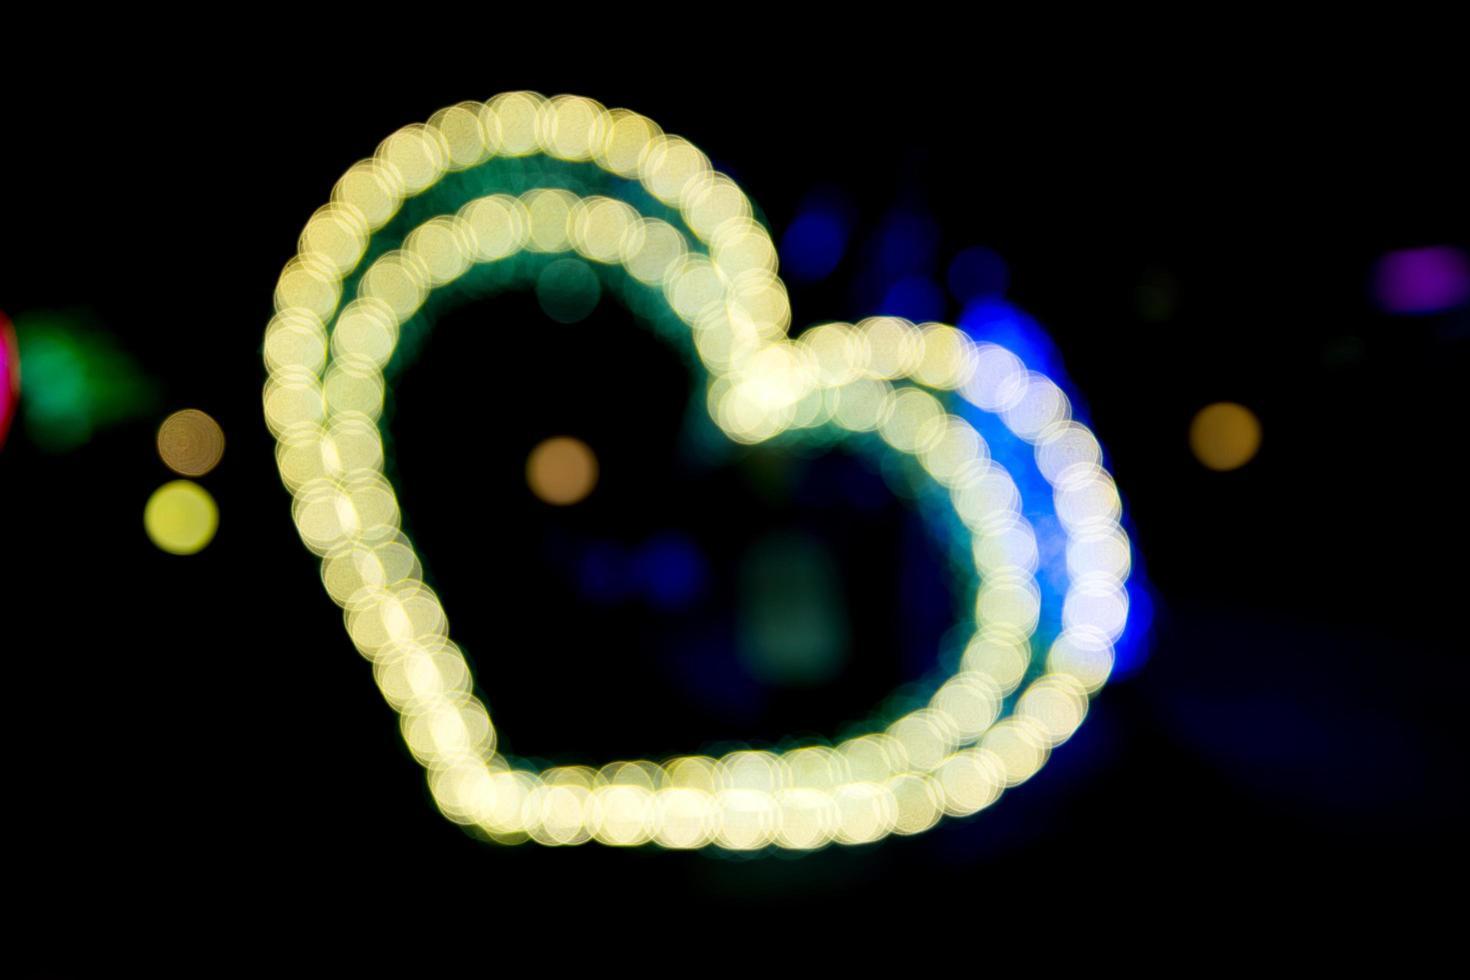 luces desenfocadas iluminadas foto